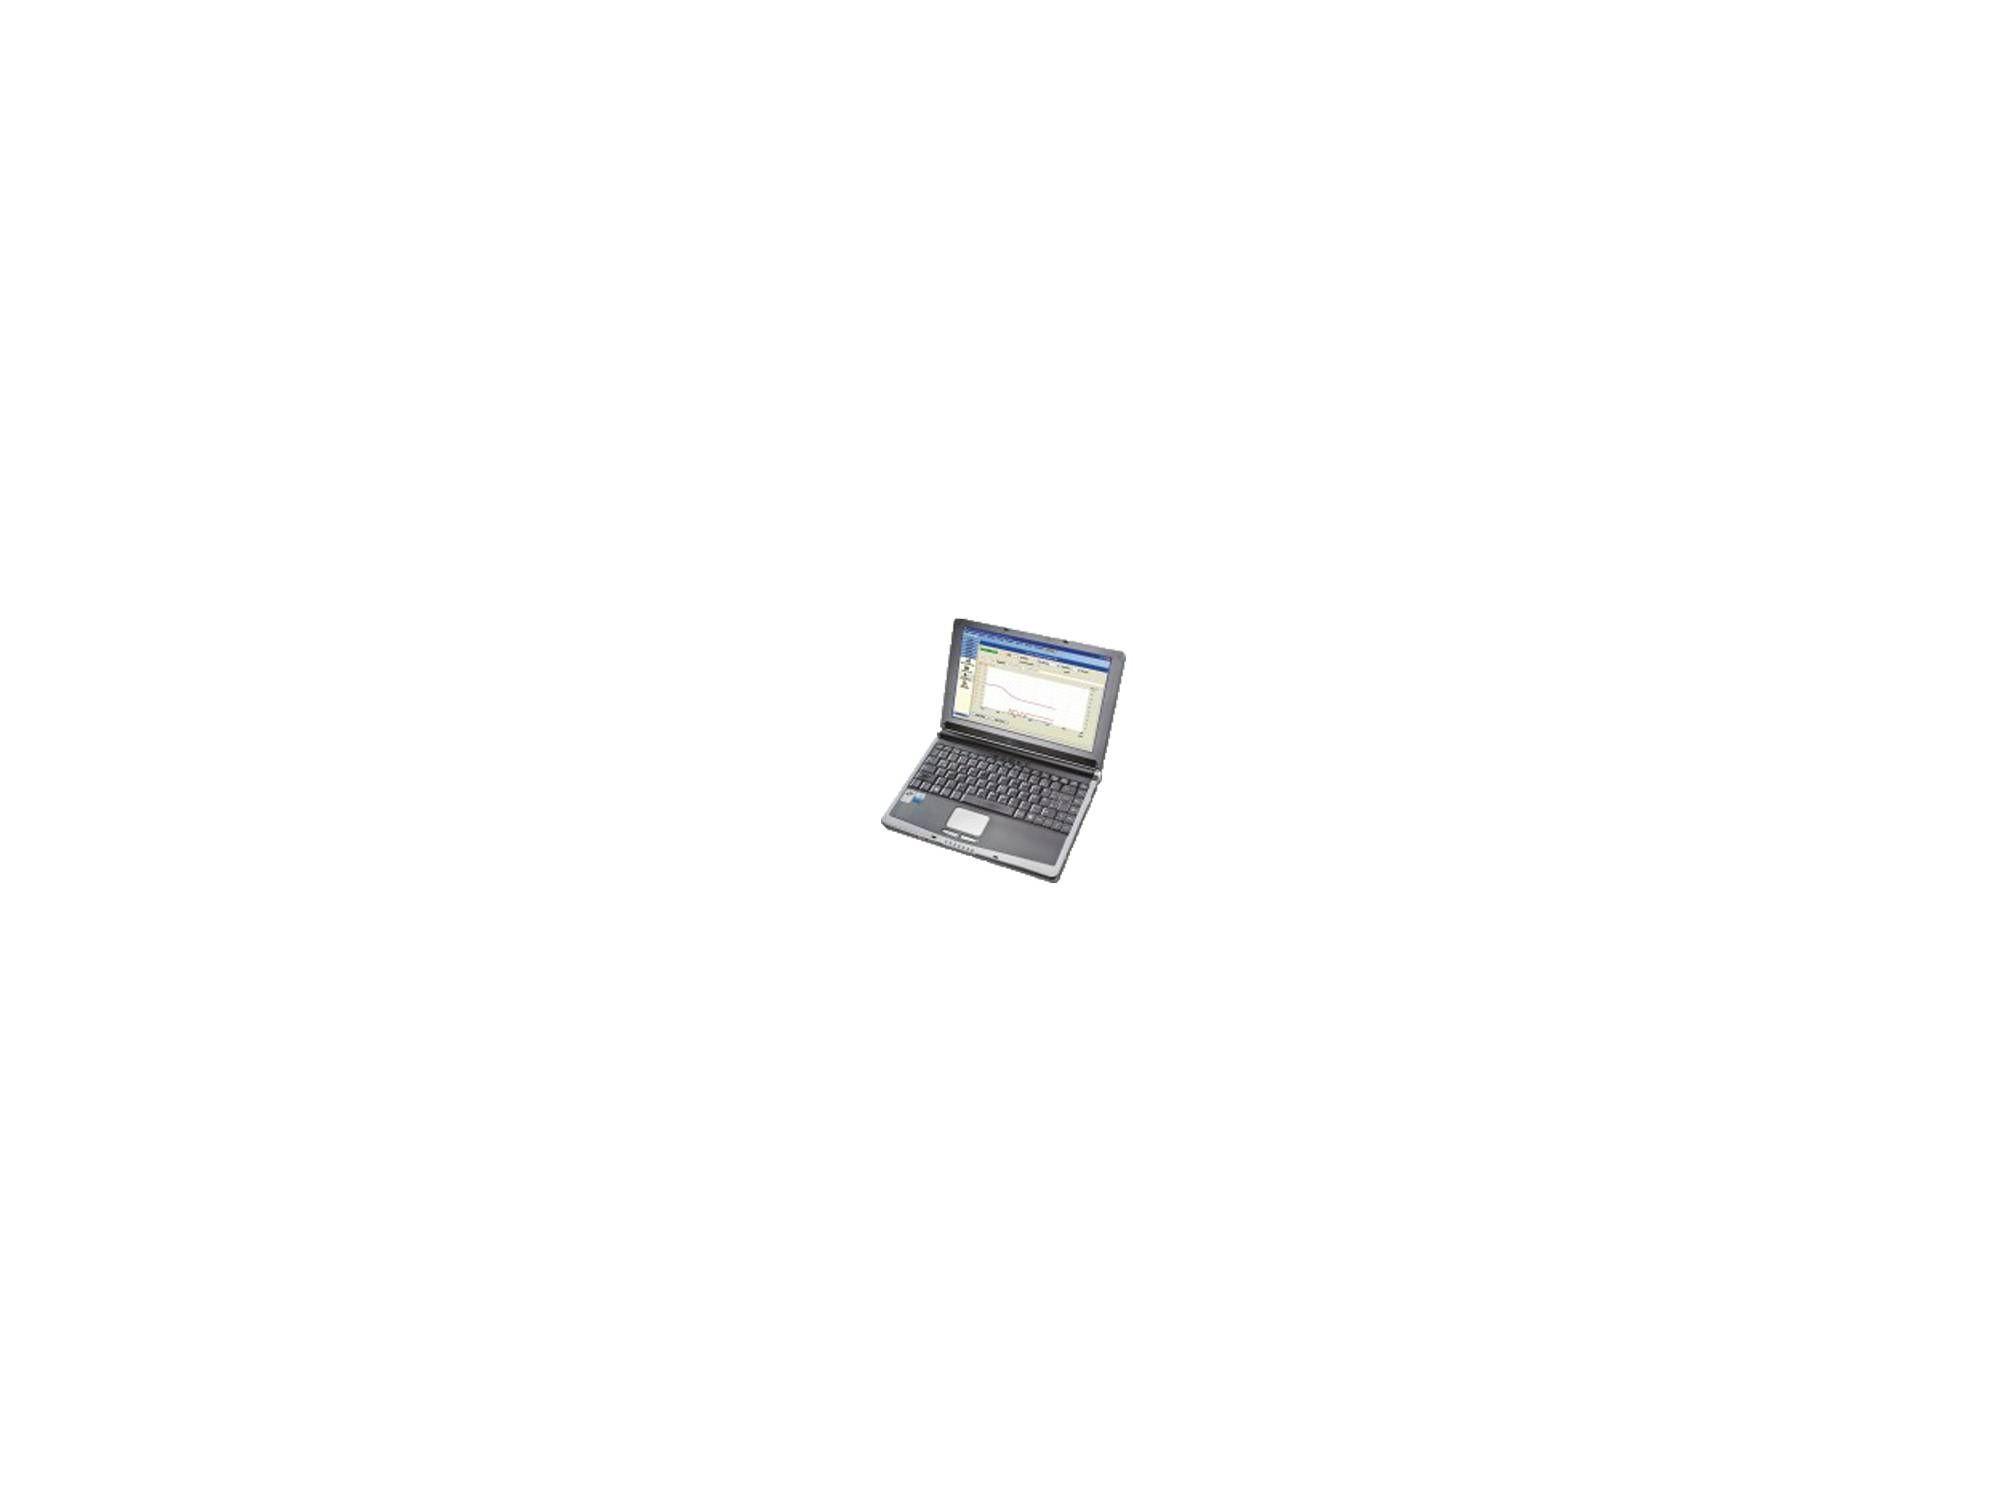 pc-auswerte-software-easyheat.jpg